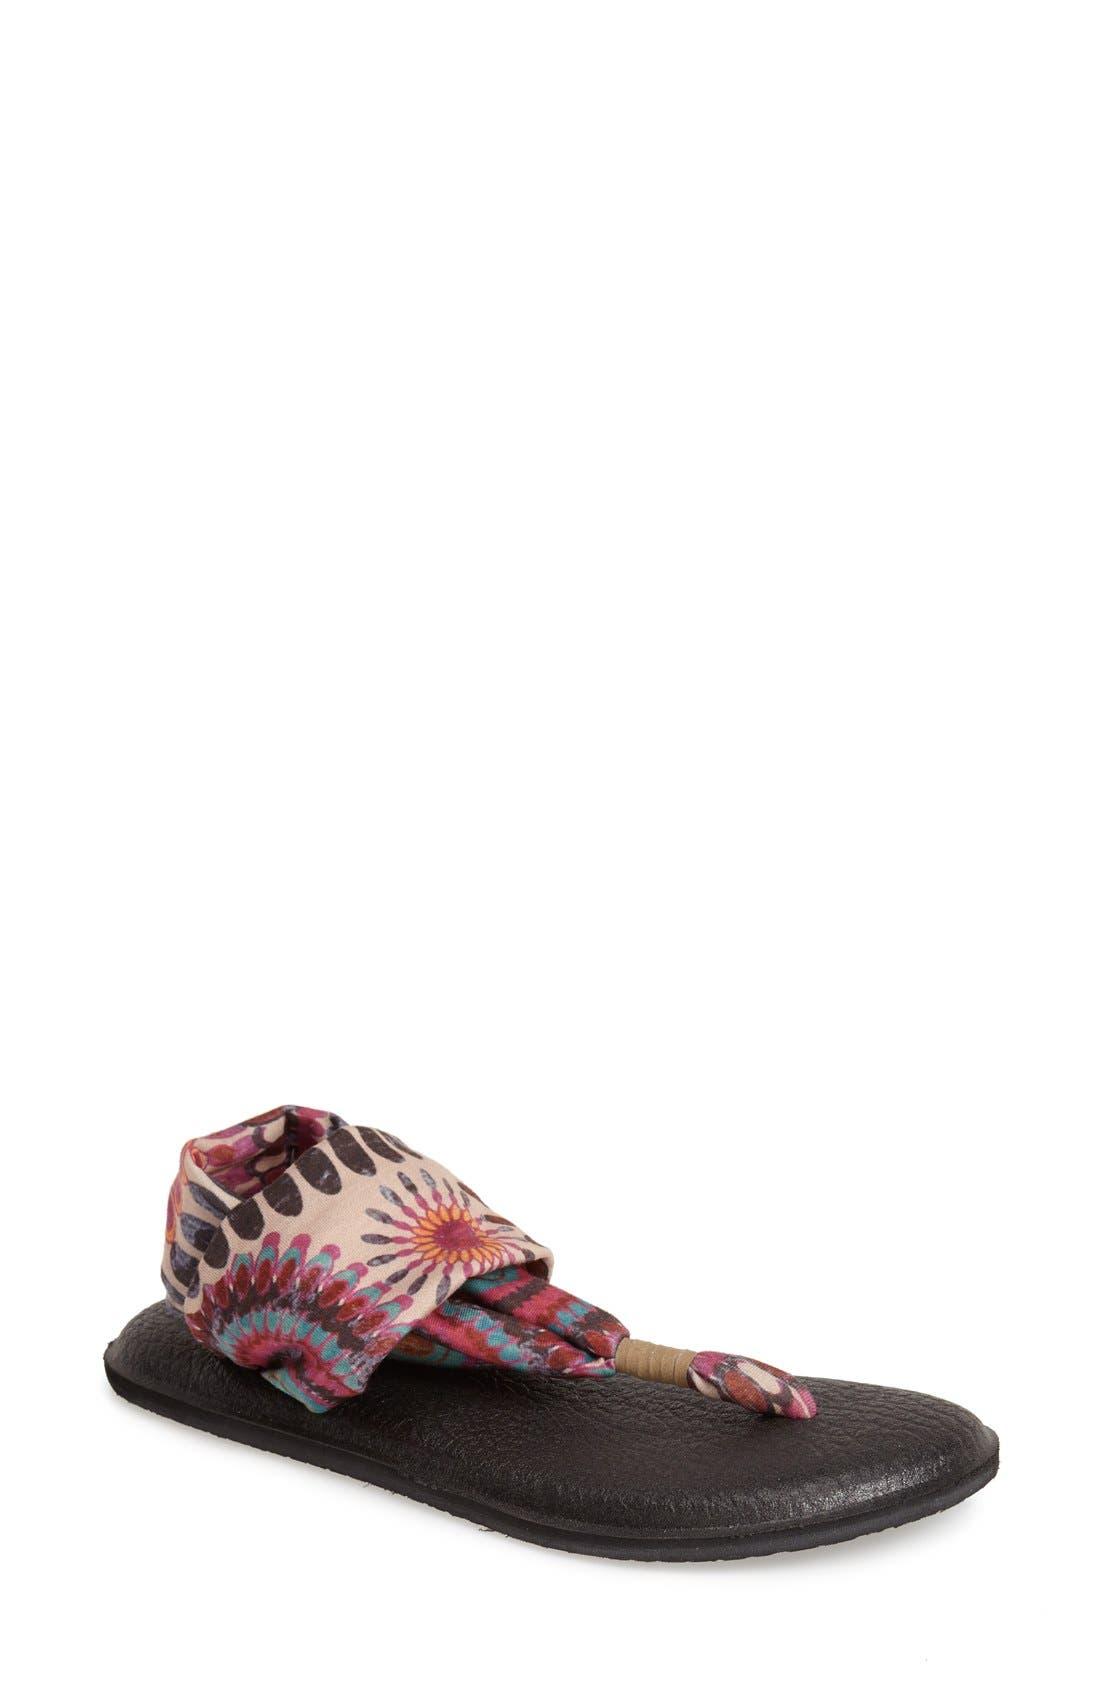 'Yoga Sling 2' Sandal,                             Main thumbnail 23, color,